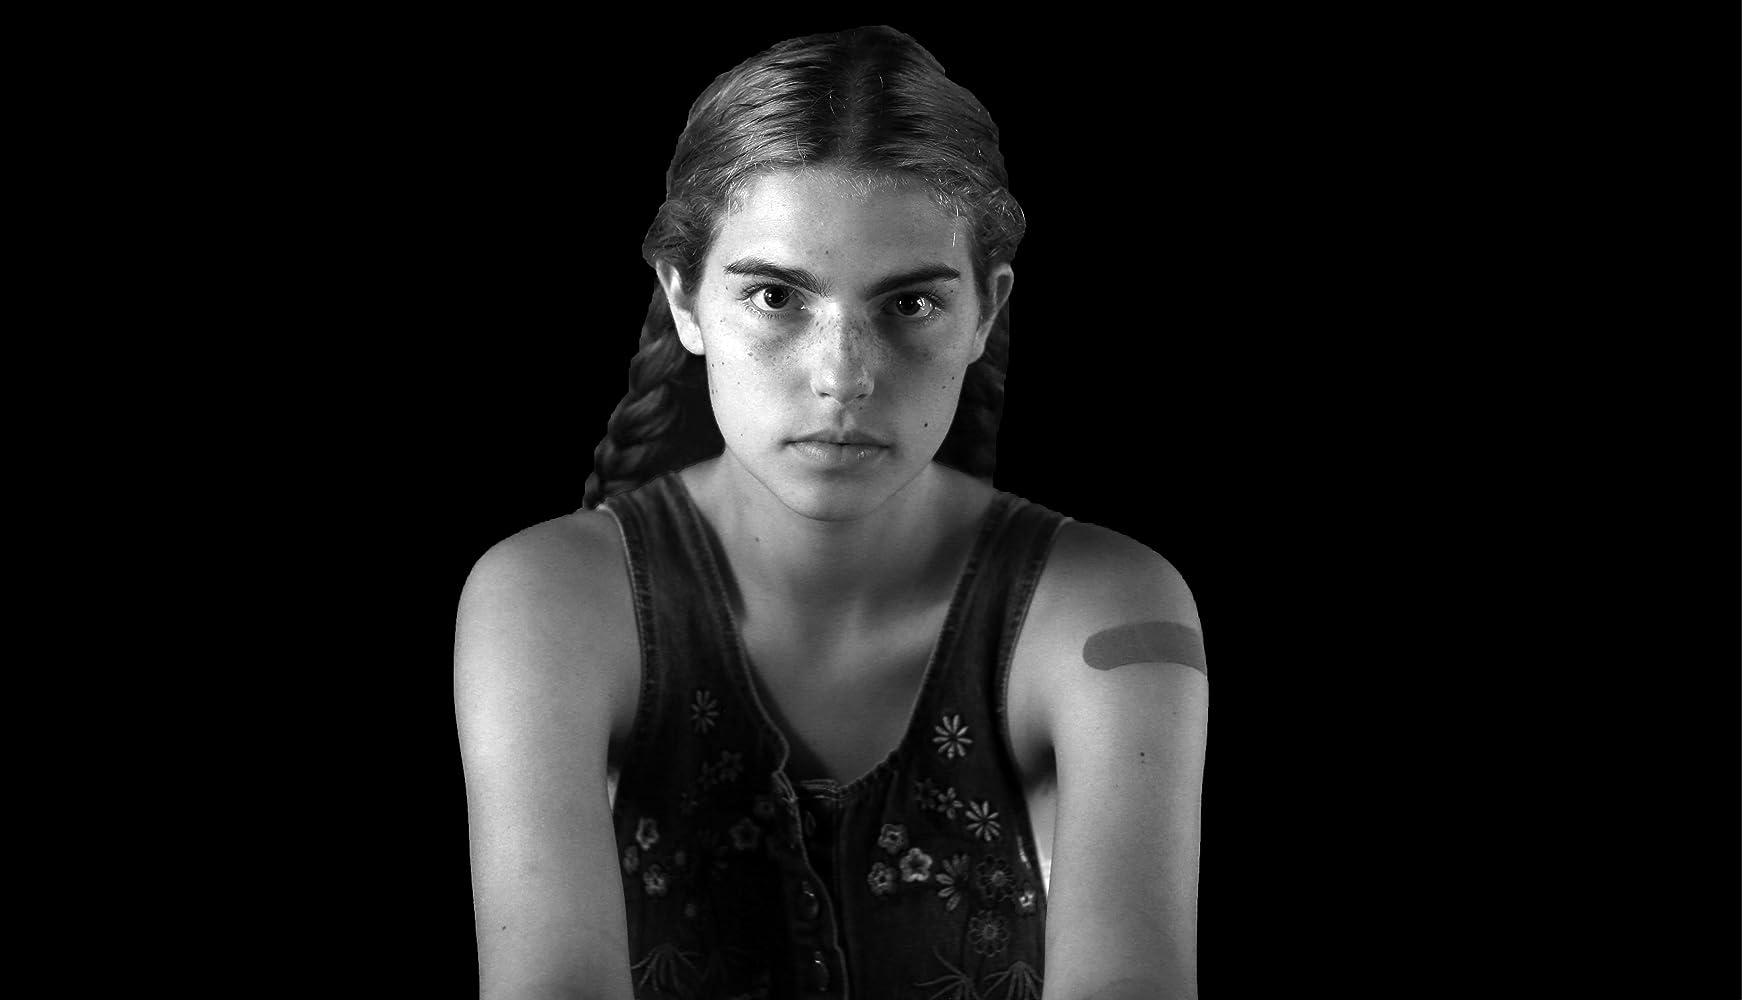 Perla Haney-Jardine Nude Photos 100